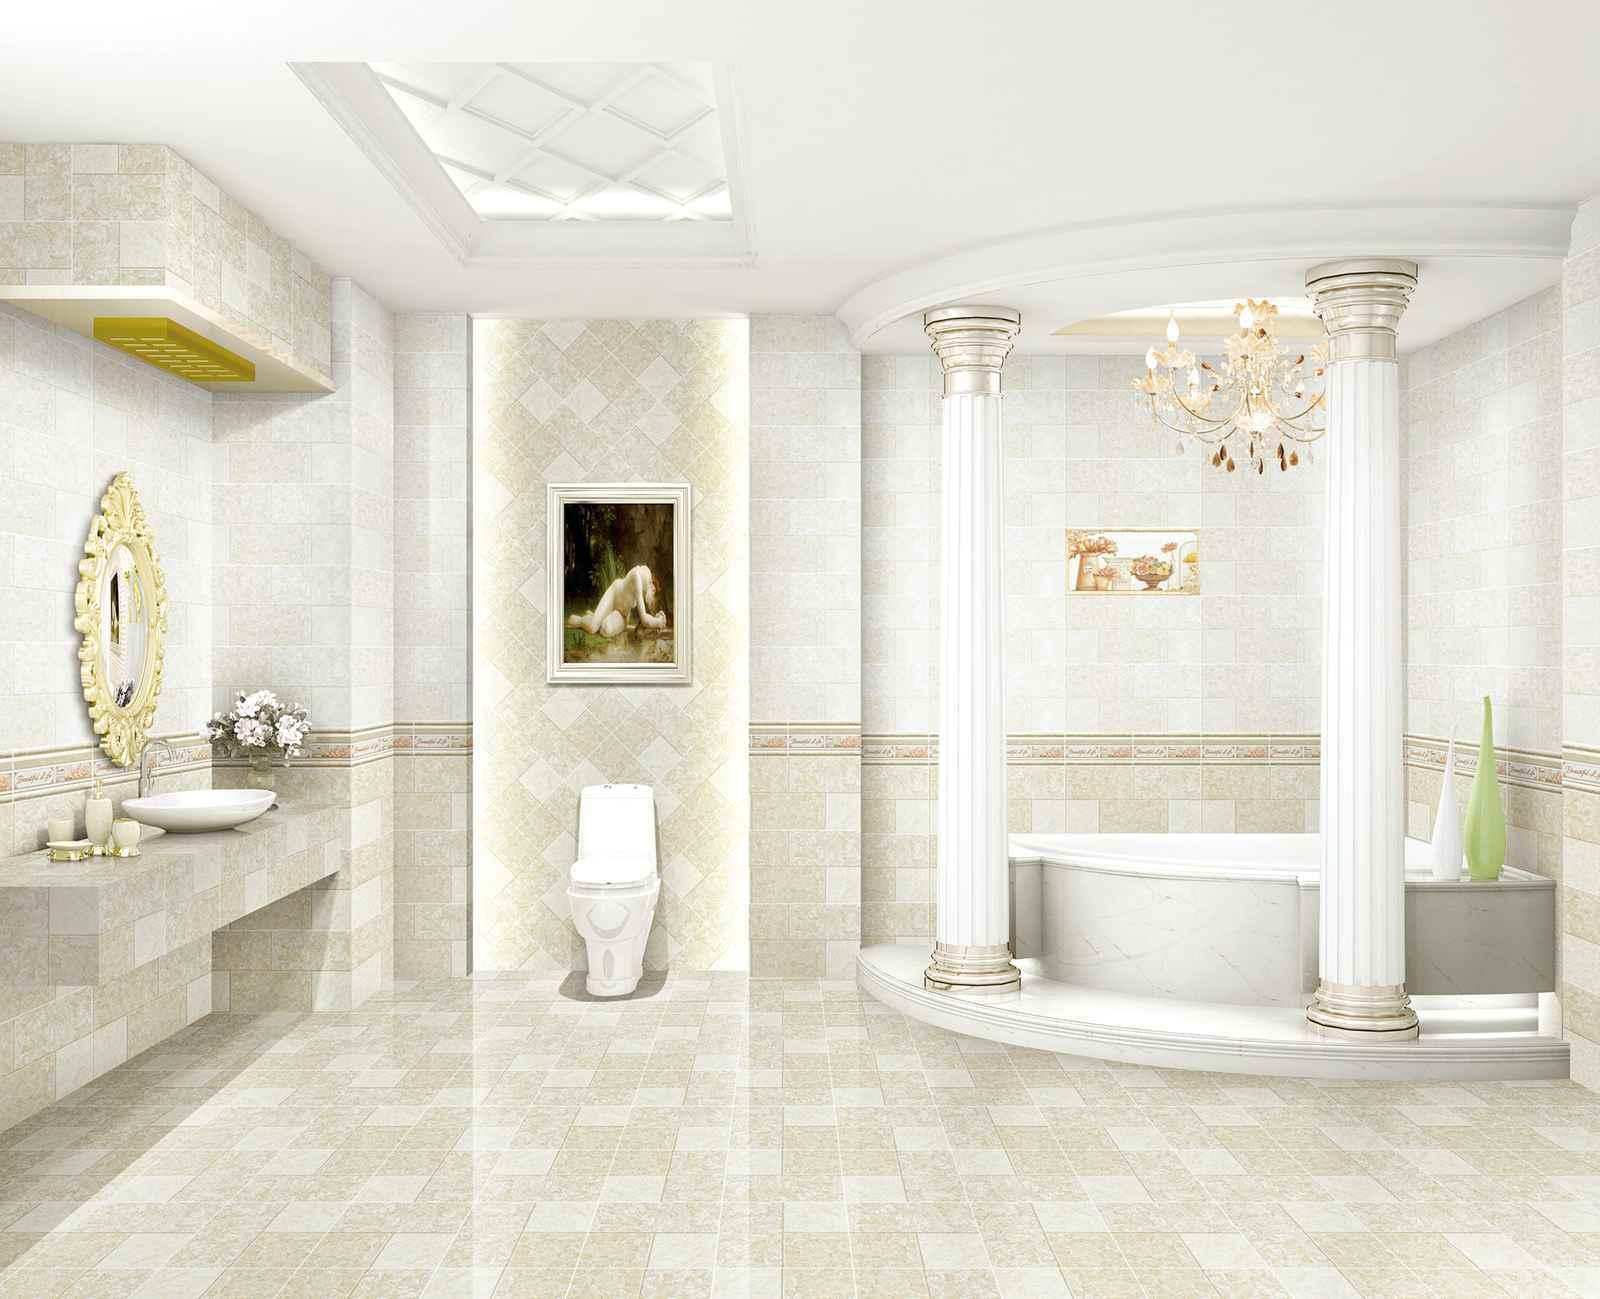 China 2015 New Design Glazed Ceramic Wall Tile for Bathroom/Kitchen ...